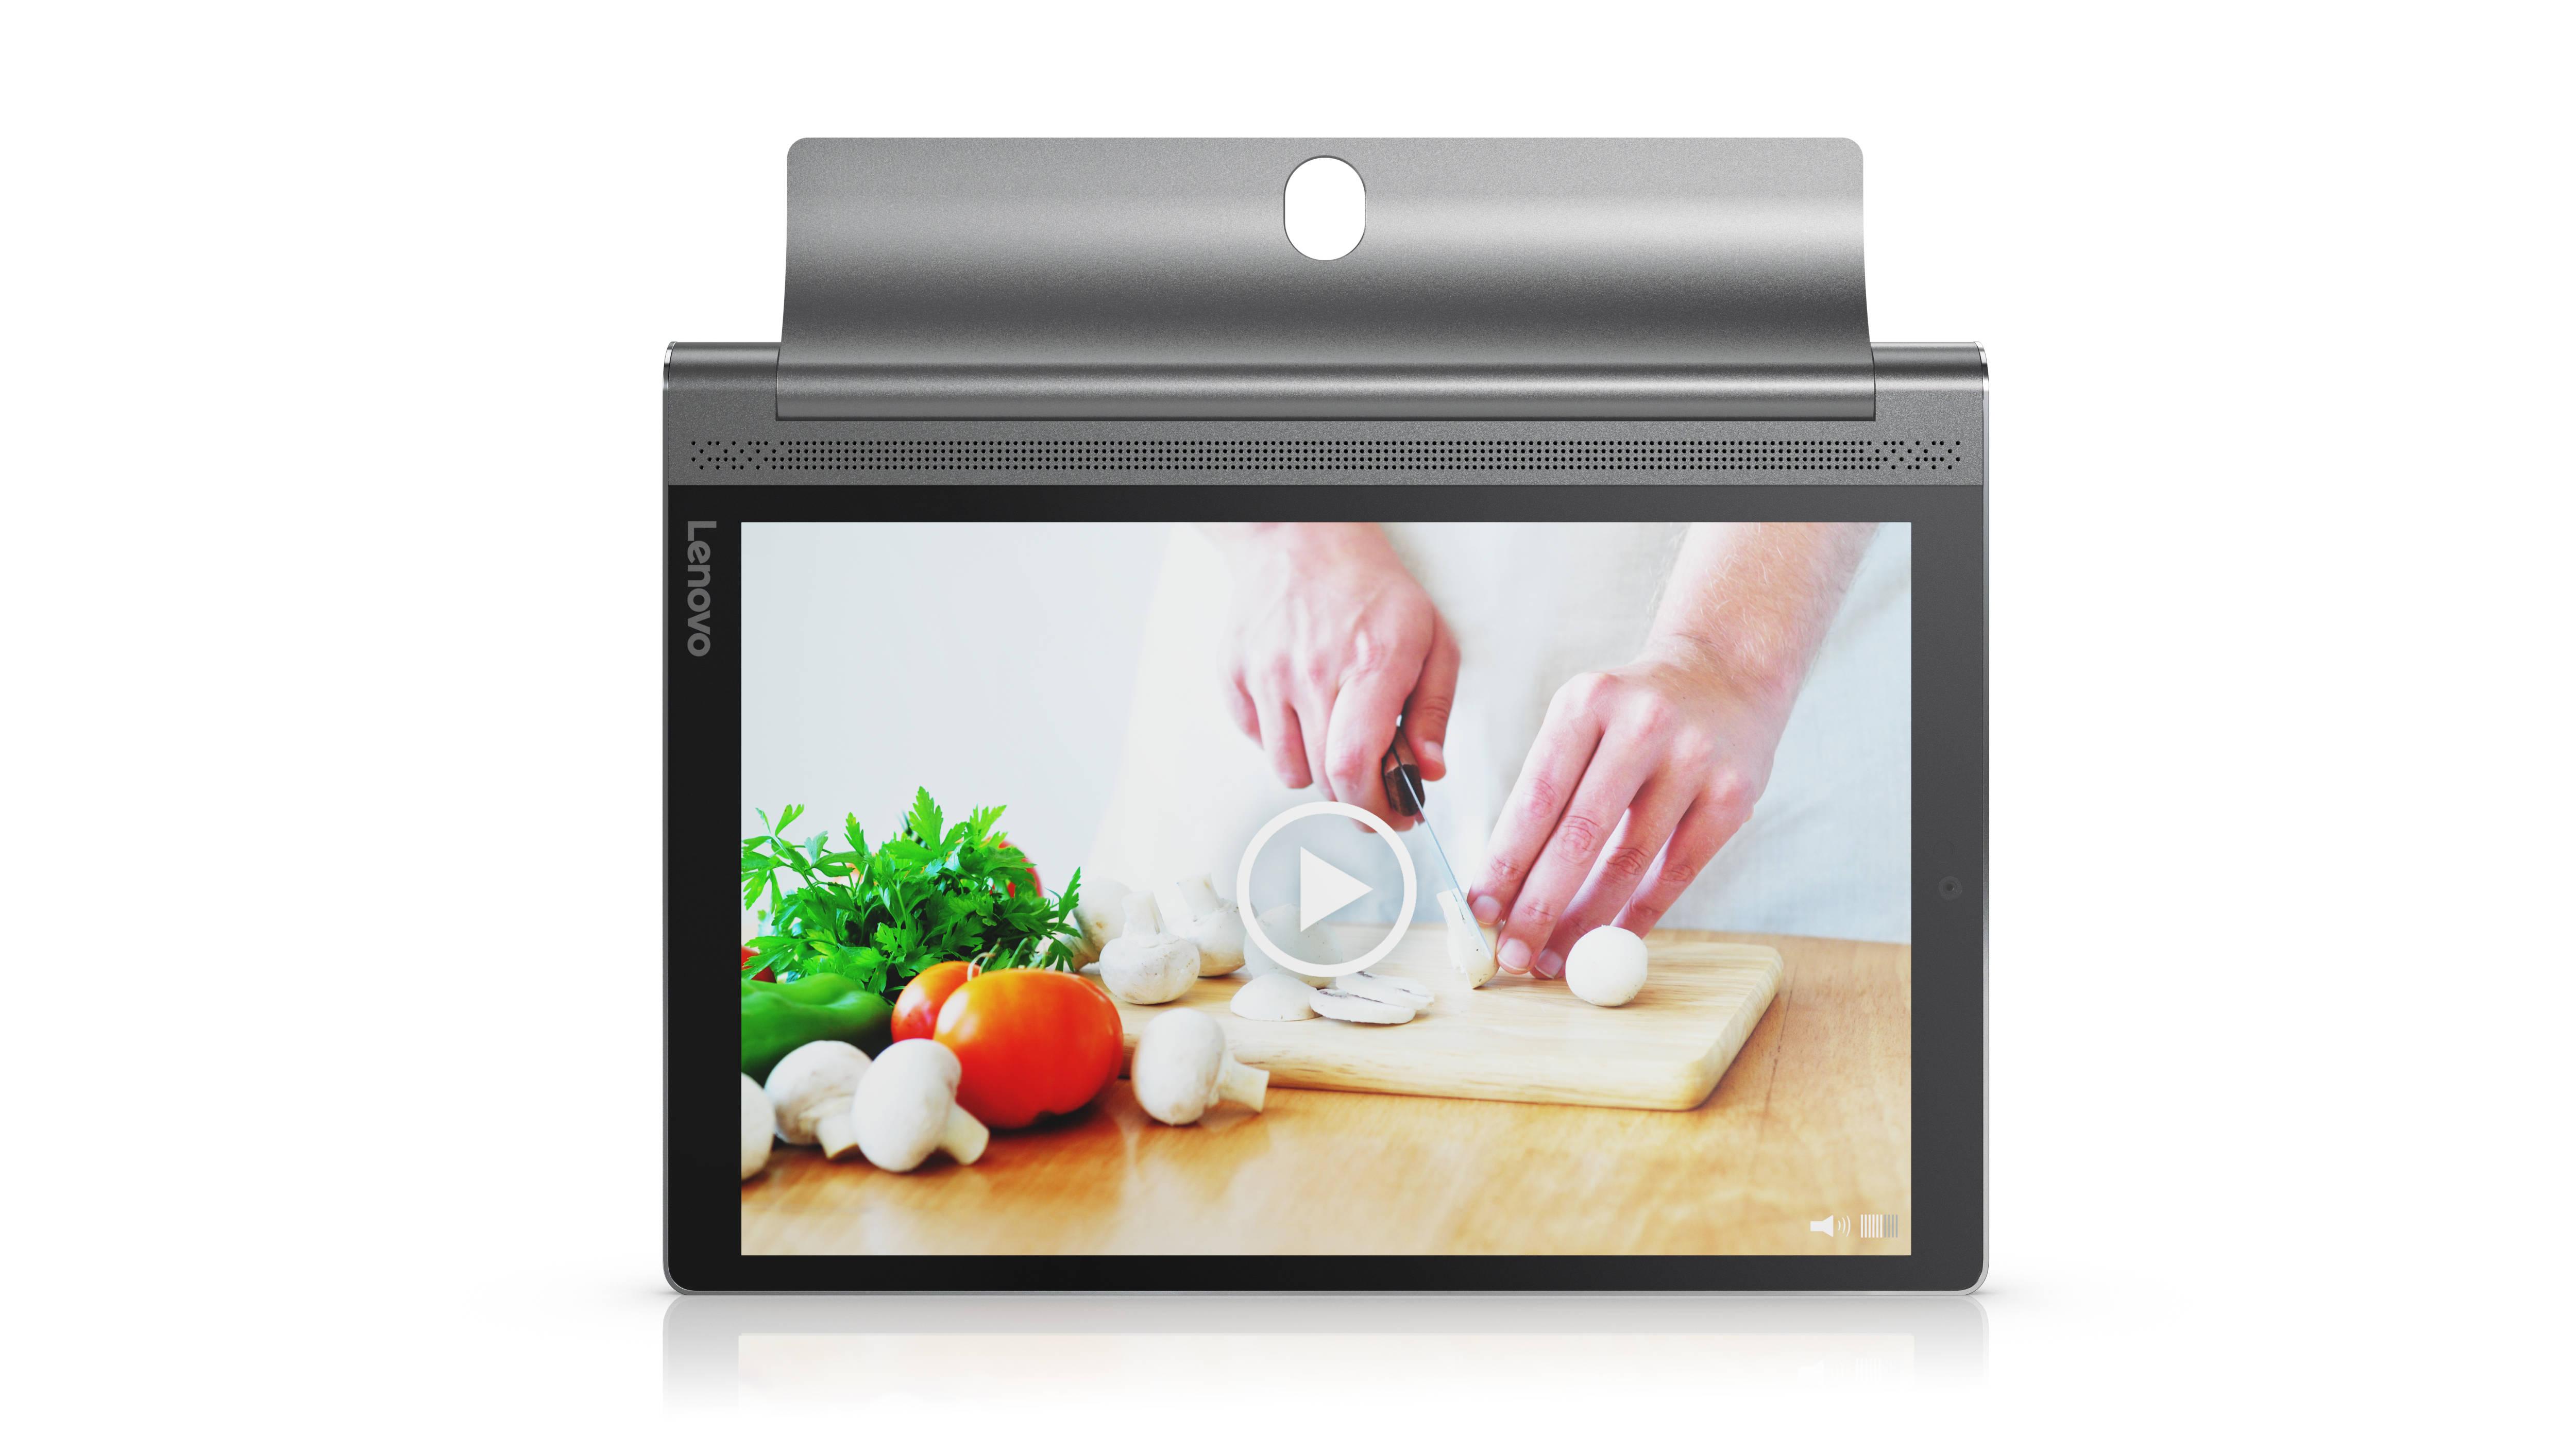 "YOGA Tablet 3 PLUS Snapdragon 1,8GHz/4GB/64GB/10,1"" IPS/2560x1600/Foto 13MPx/LTE/Android6.0 černá ZA1R0055CZ"